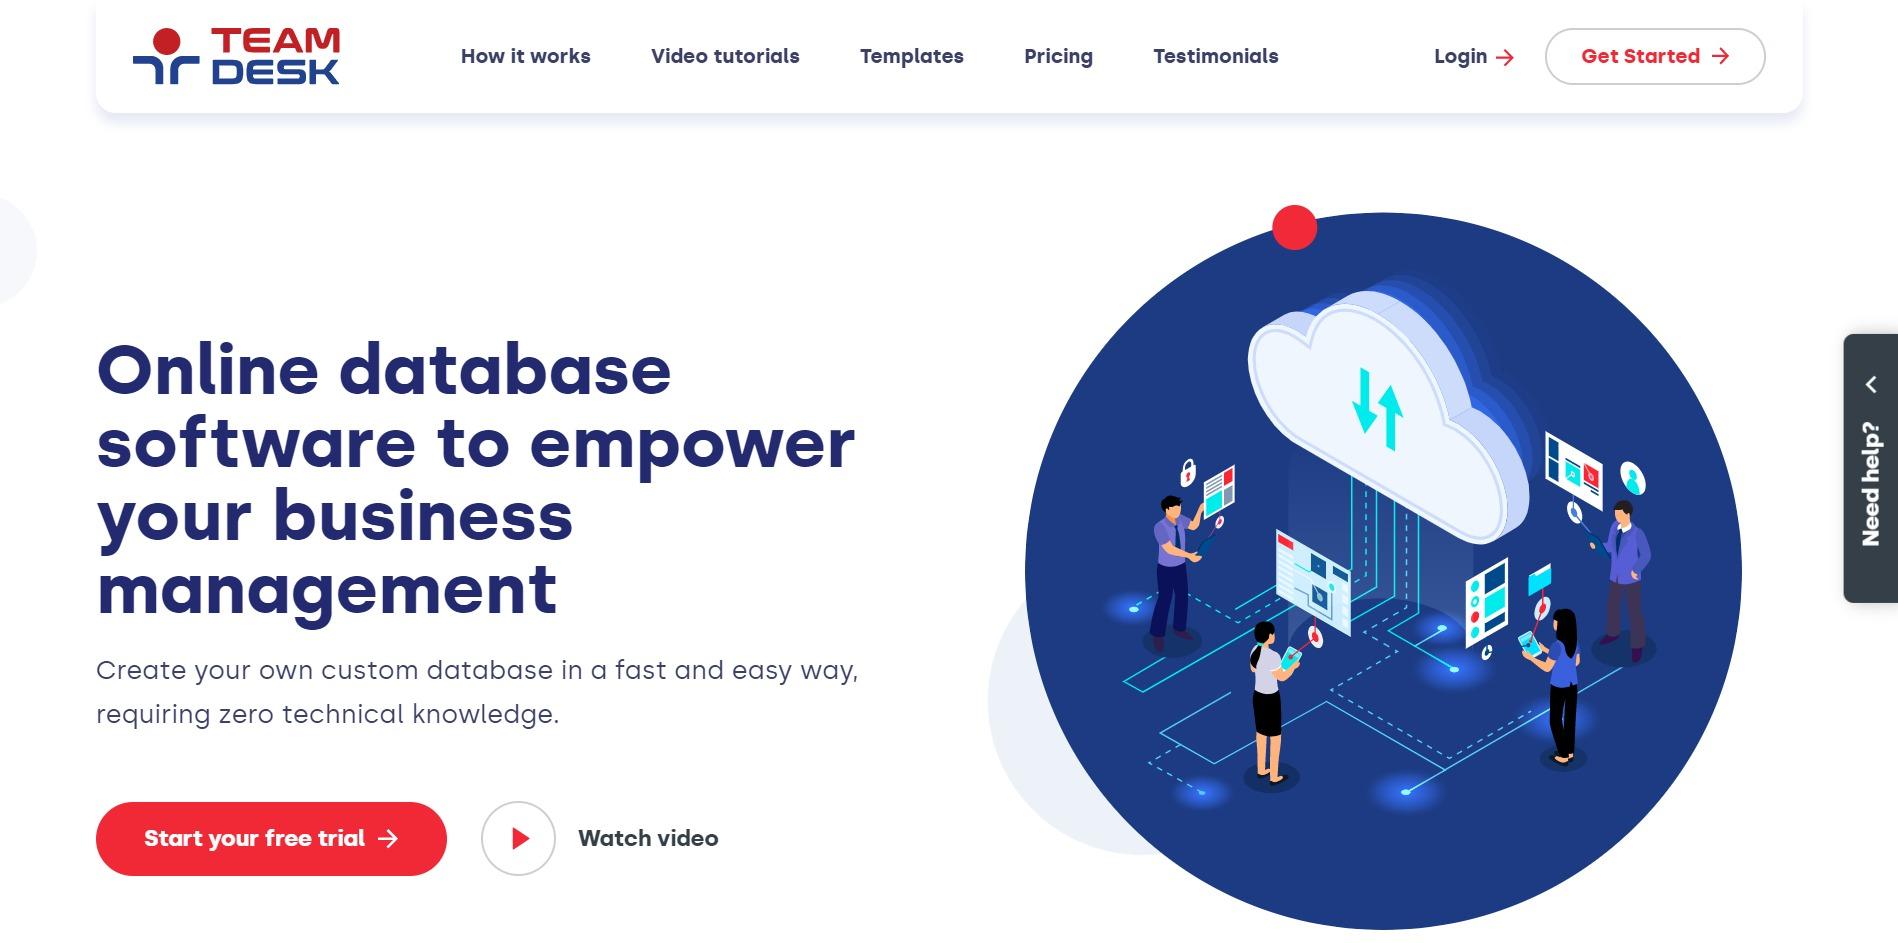 TeamDesk Main Page